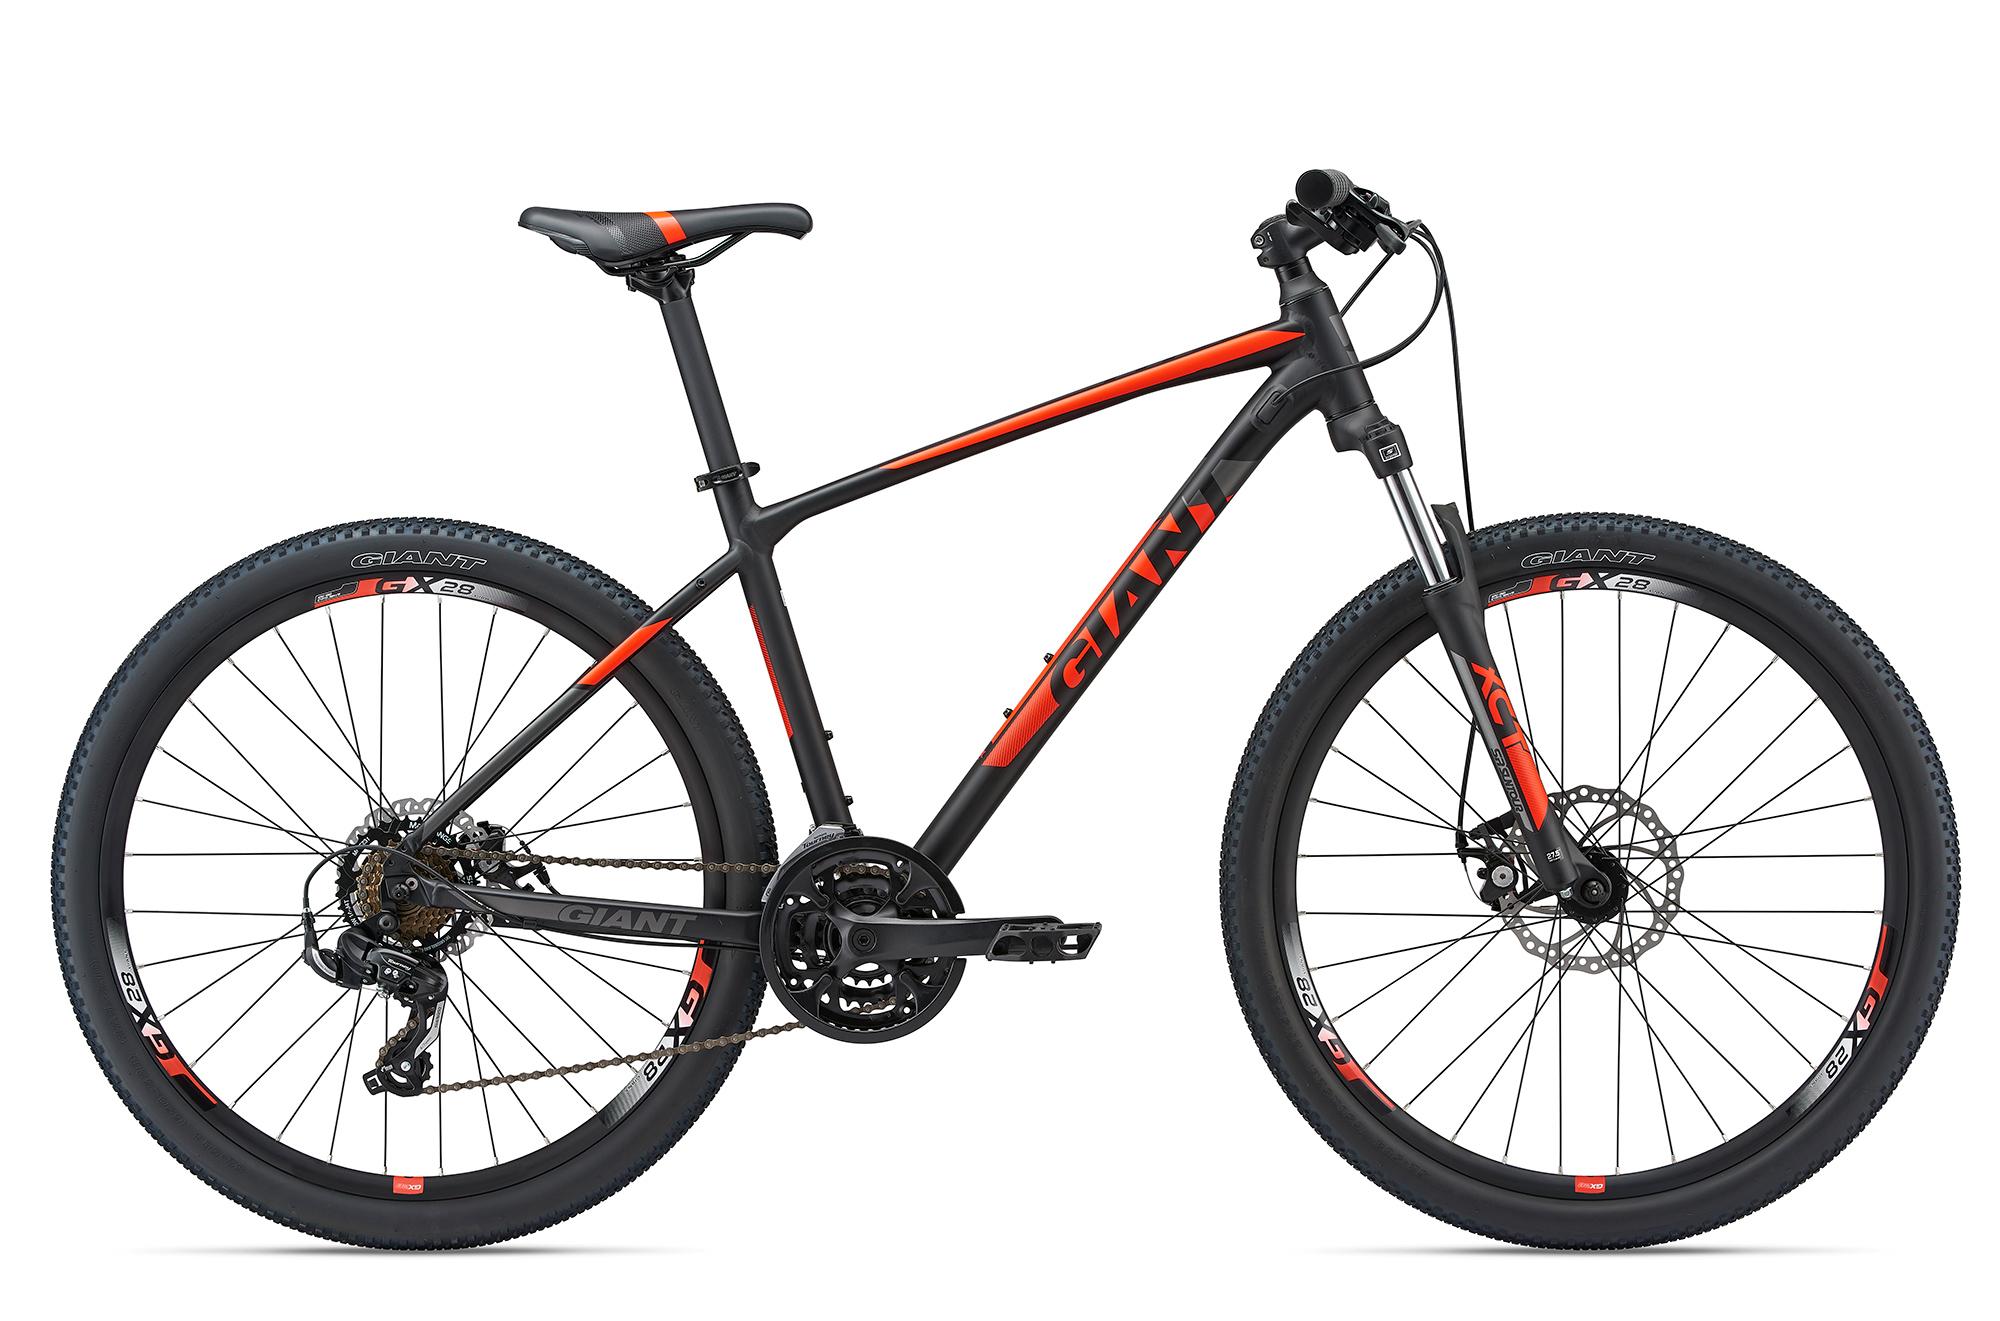 2018 Giant Atx 27 5 Hadley Cycles